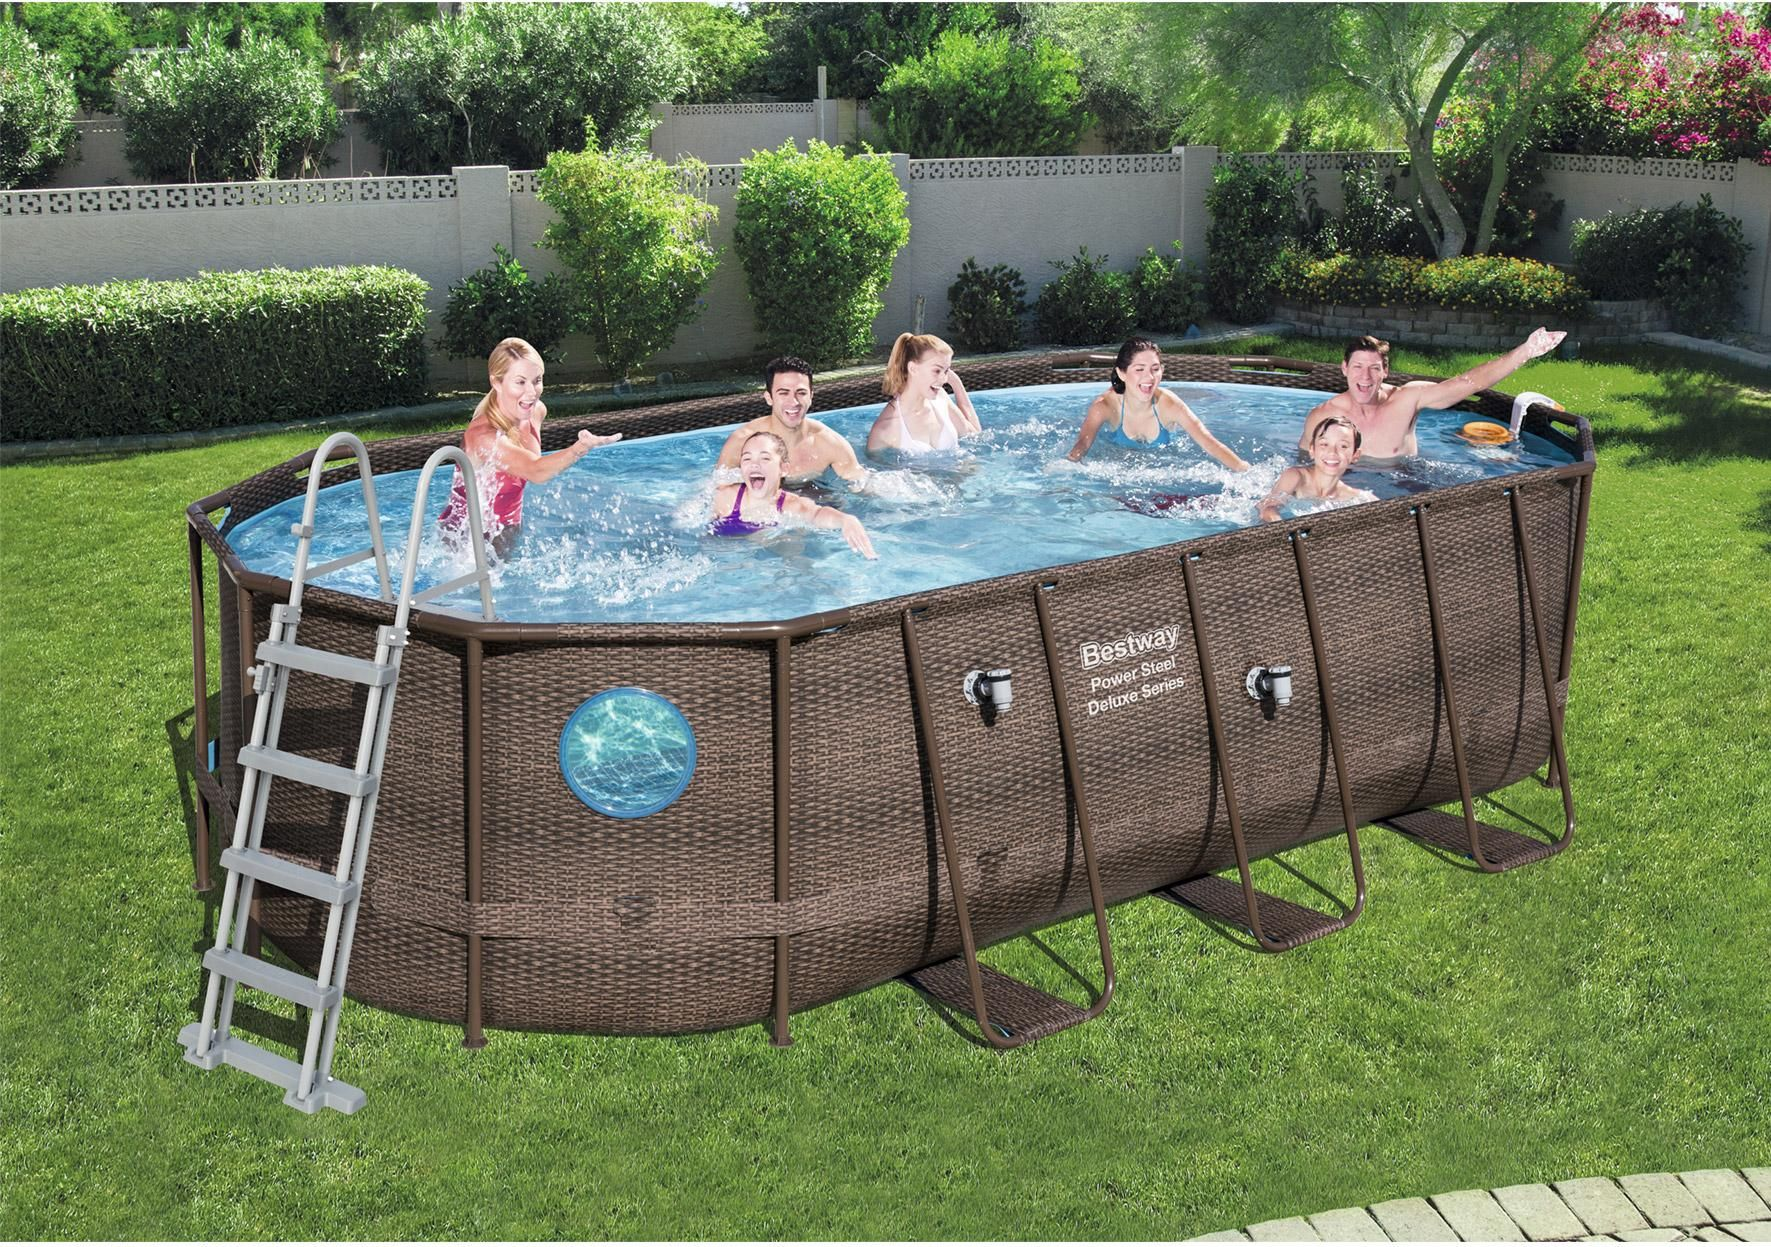 Piscine Hors Sol Tubulaire Swim Vista Pool Bestway L 5 49 X L 3 41 X H 1 22 M Piscine Tubulaire Piscine Piscine Ovale